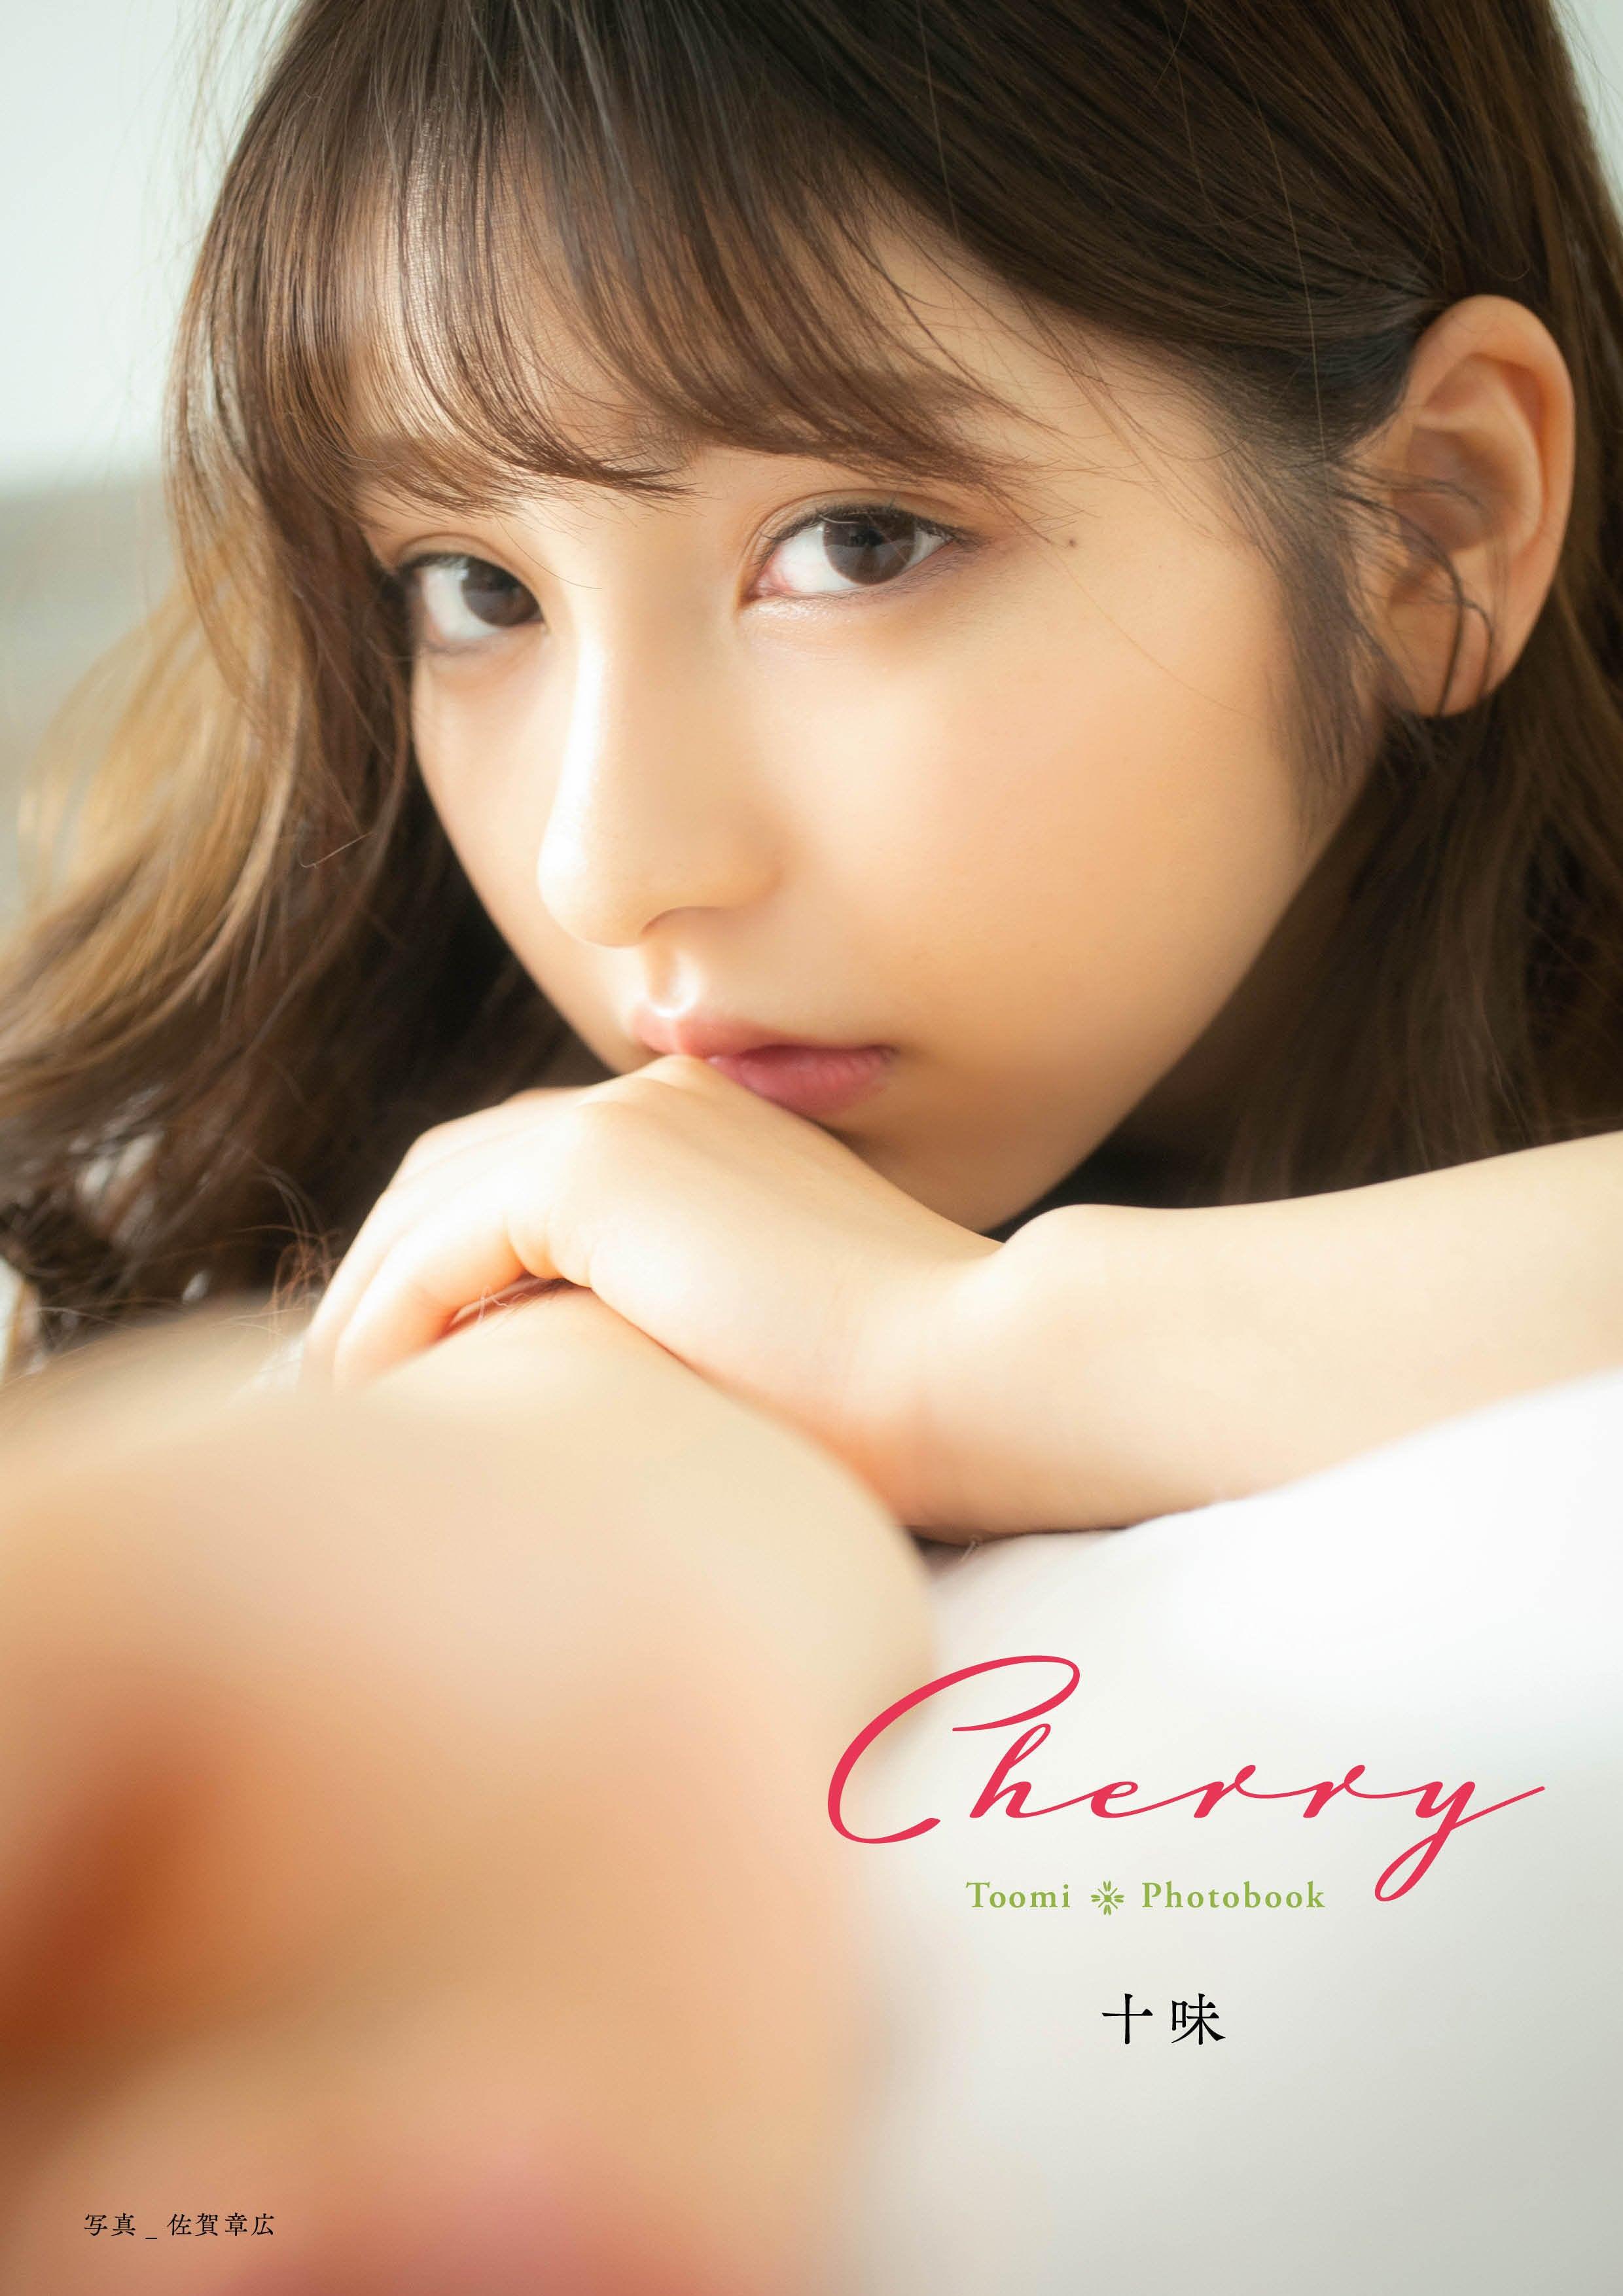 【PHOTO BOOK】十味/cherry【AIPB-0032】特別ブロマイド1枚付